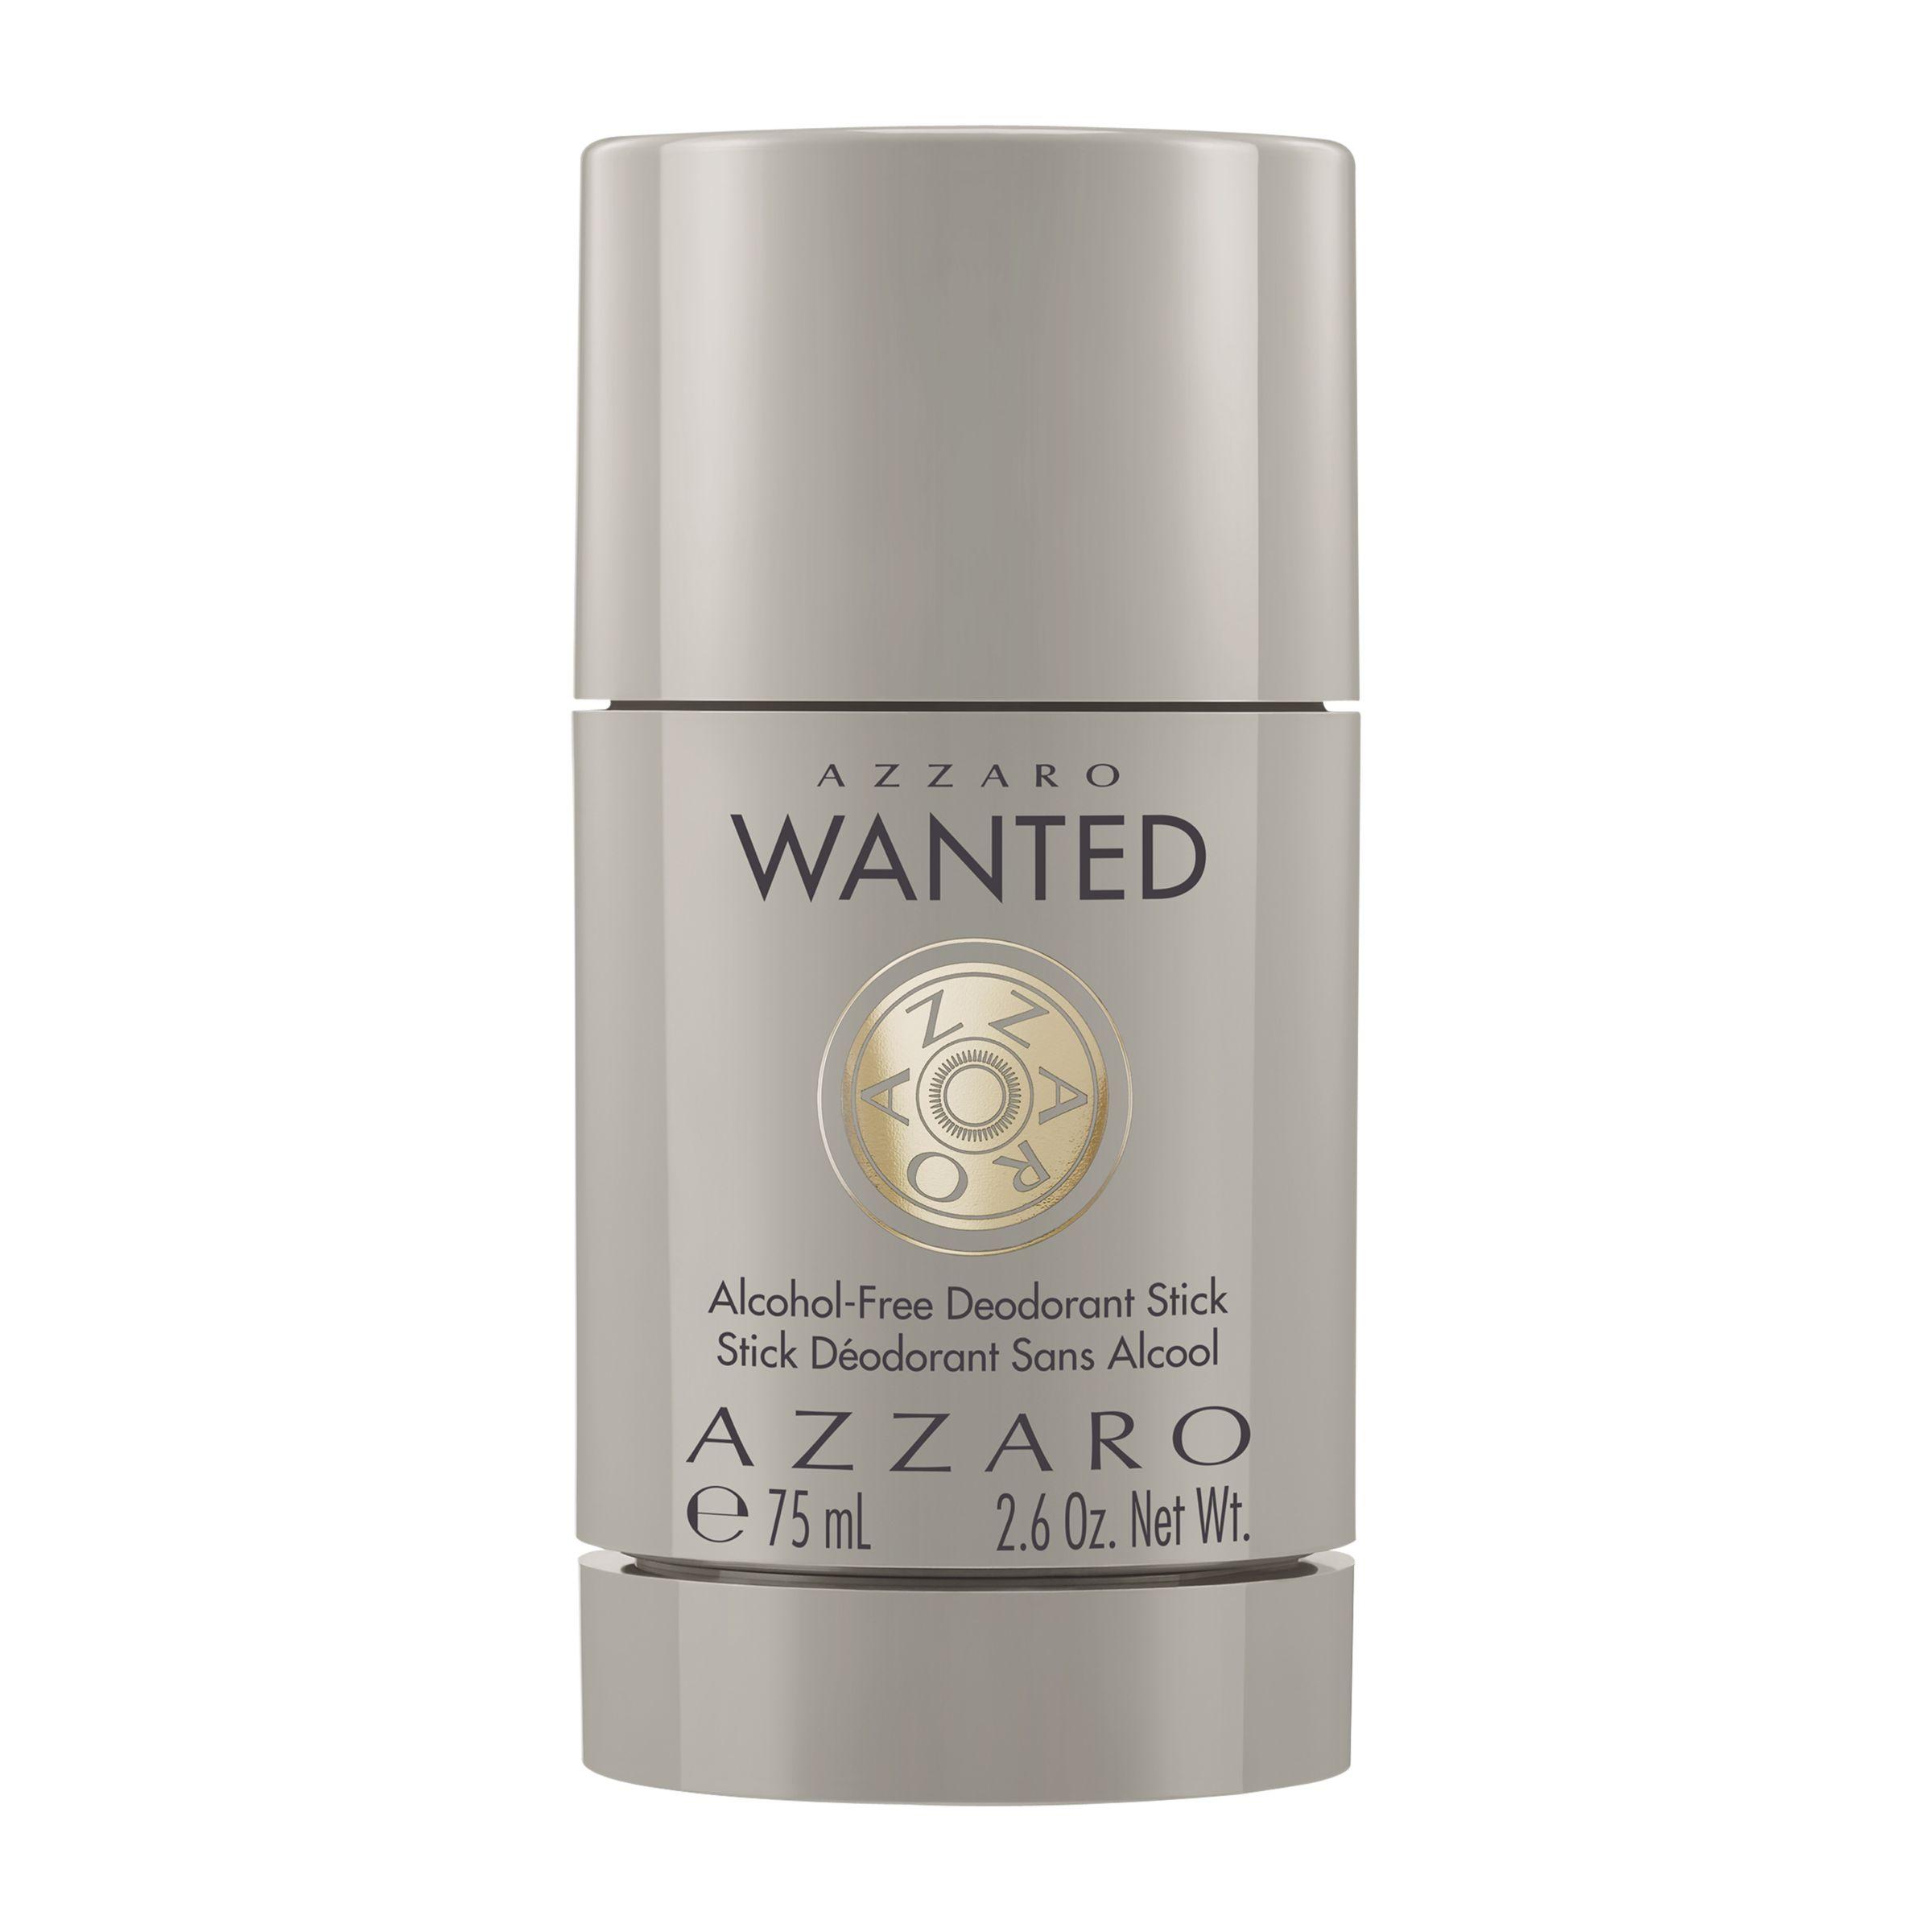 Azzaro Azzaro Wanted Alcohol-Free Deodorant Stick, 75ml